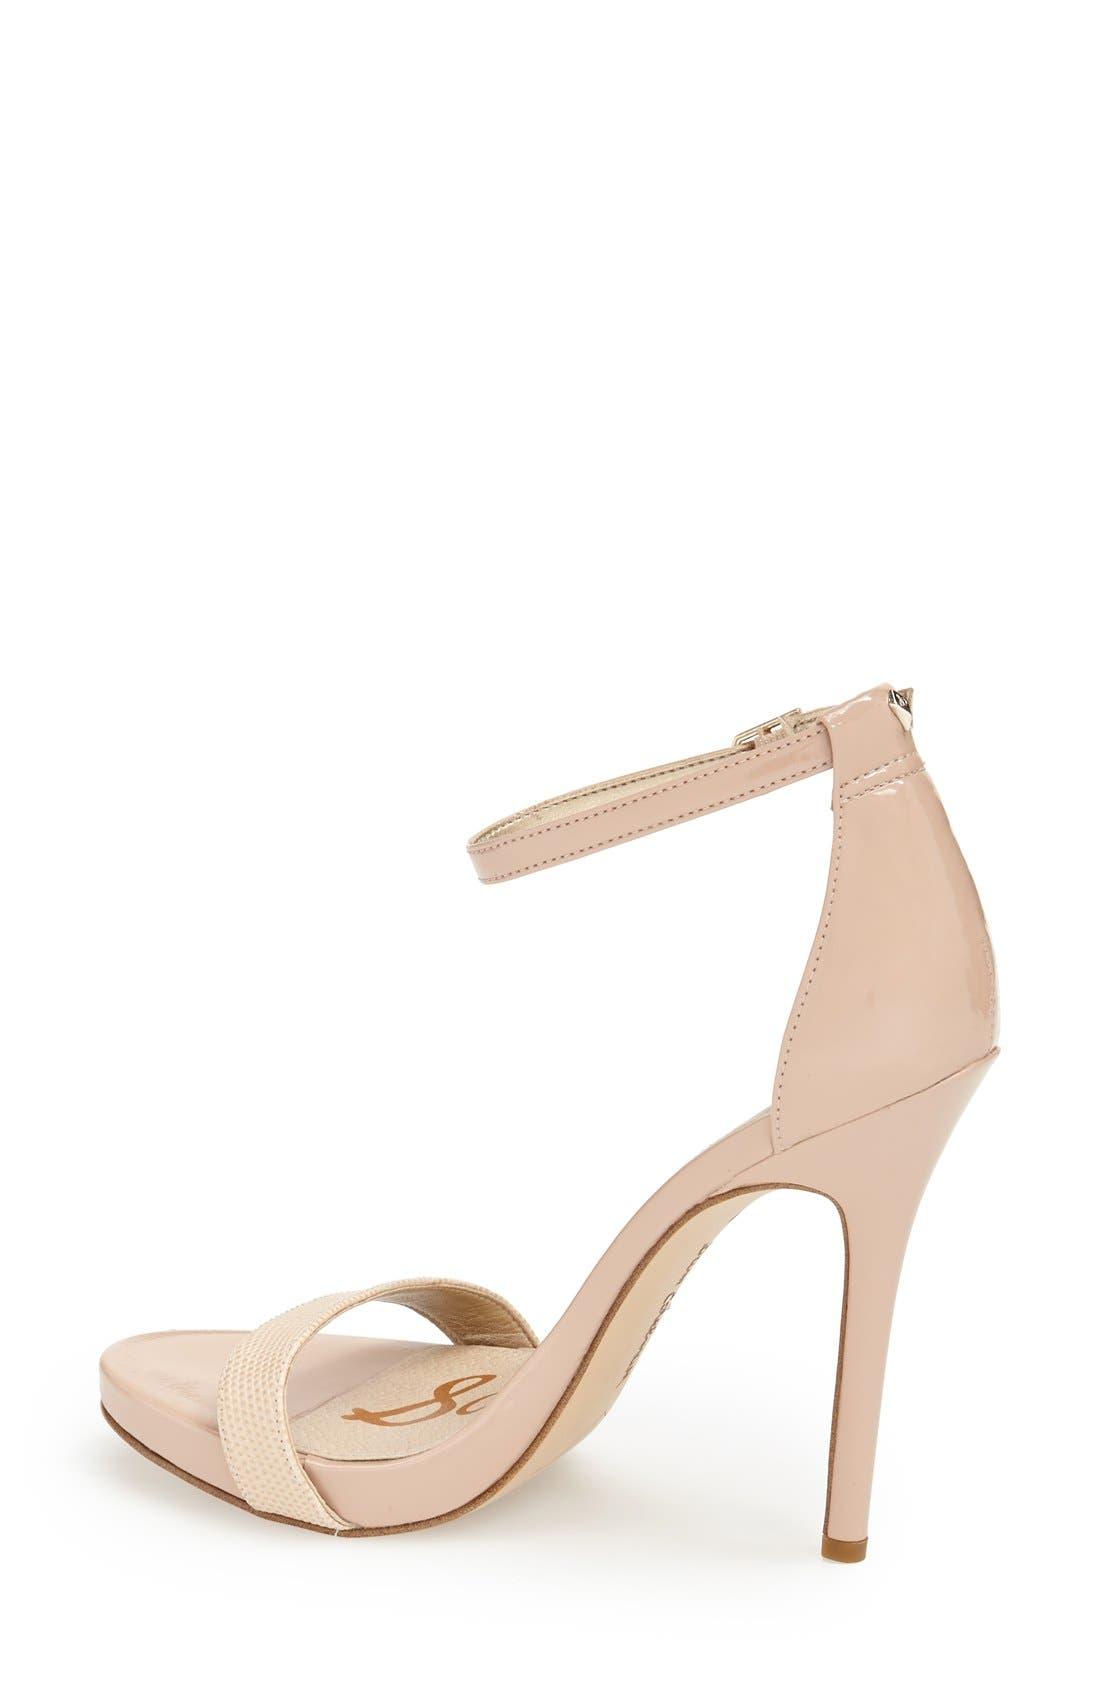 ,                             'Eleanor' Ankle Strap Sandal,                             Alternate thumbnail 110, color,                             255